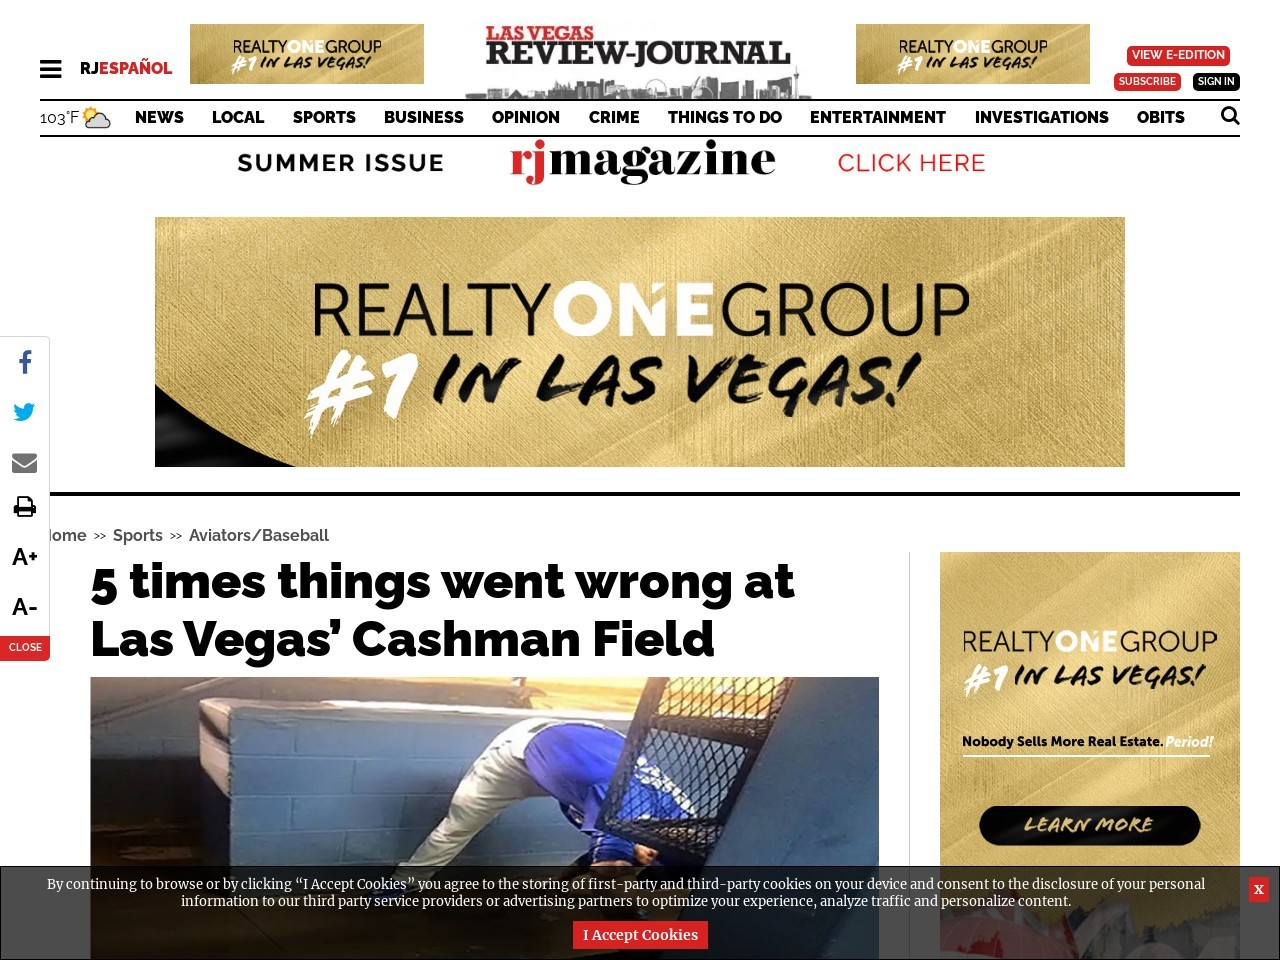 5 times things went wrong at Las Vegas' Cashman Field